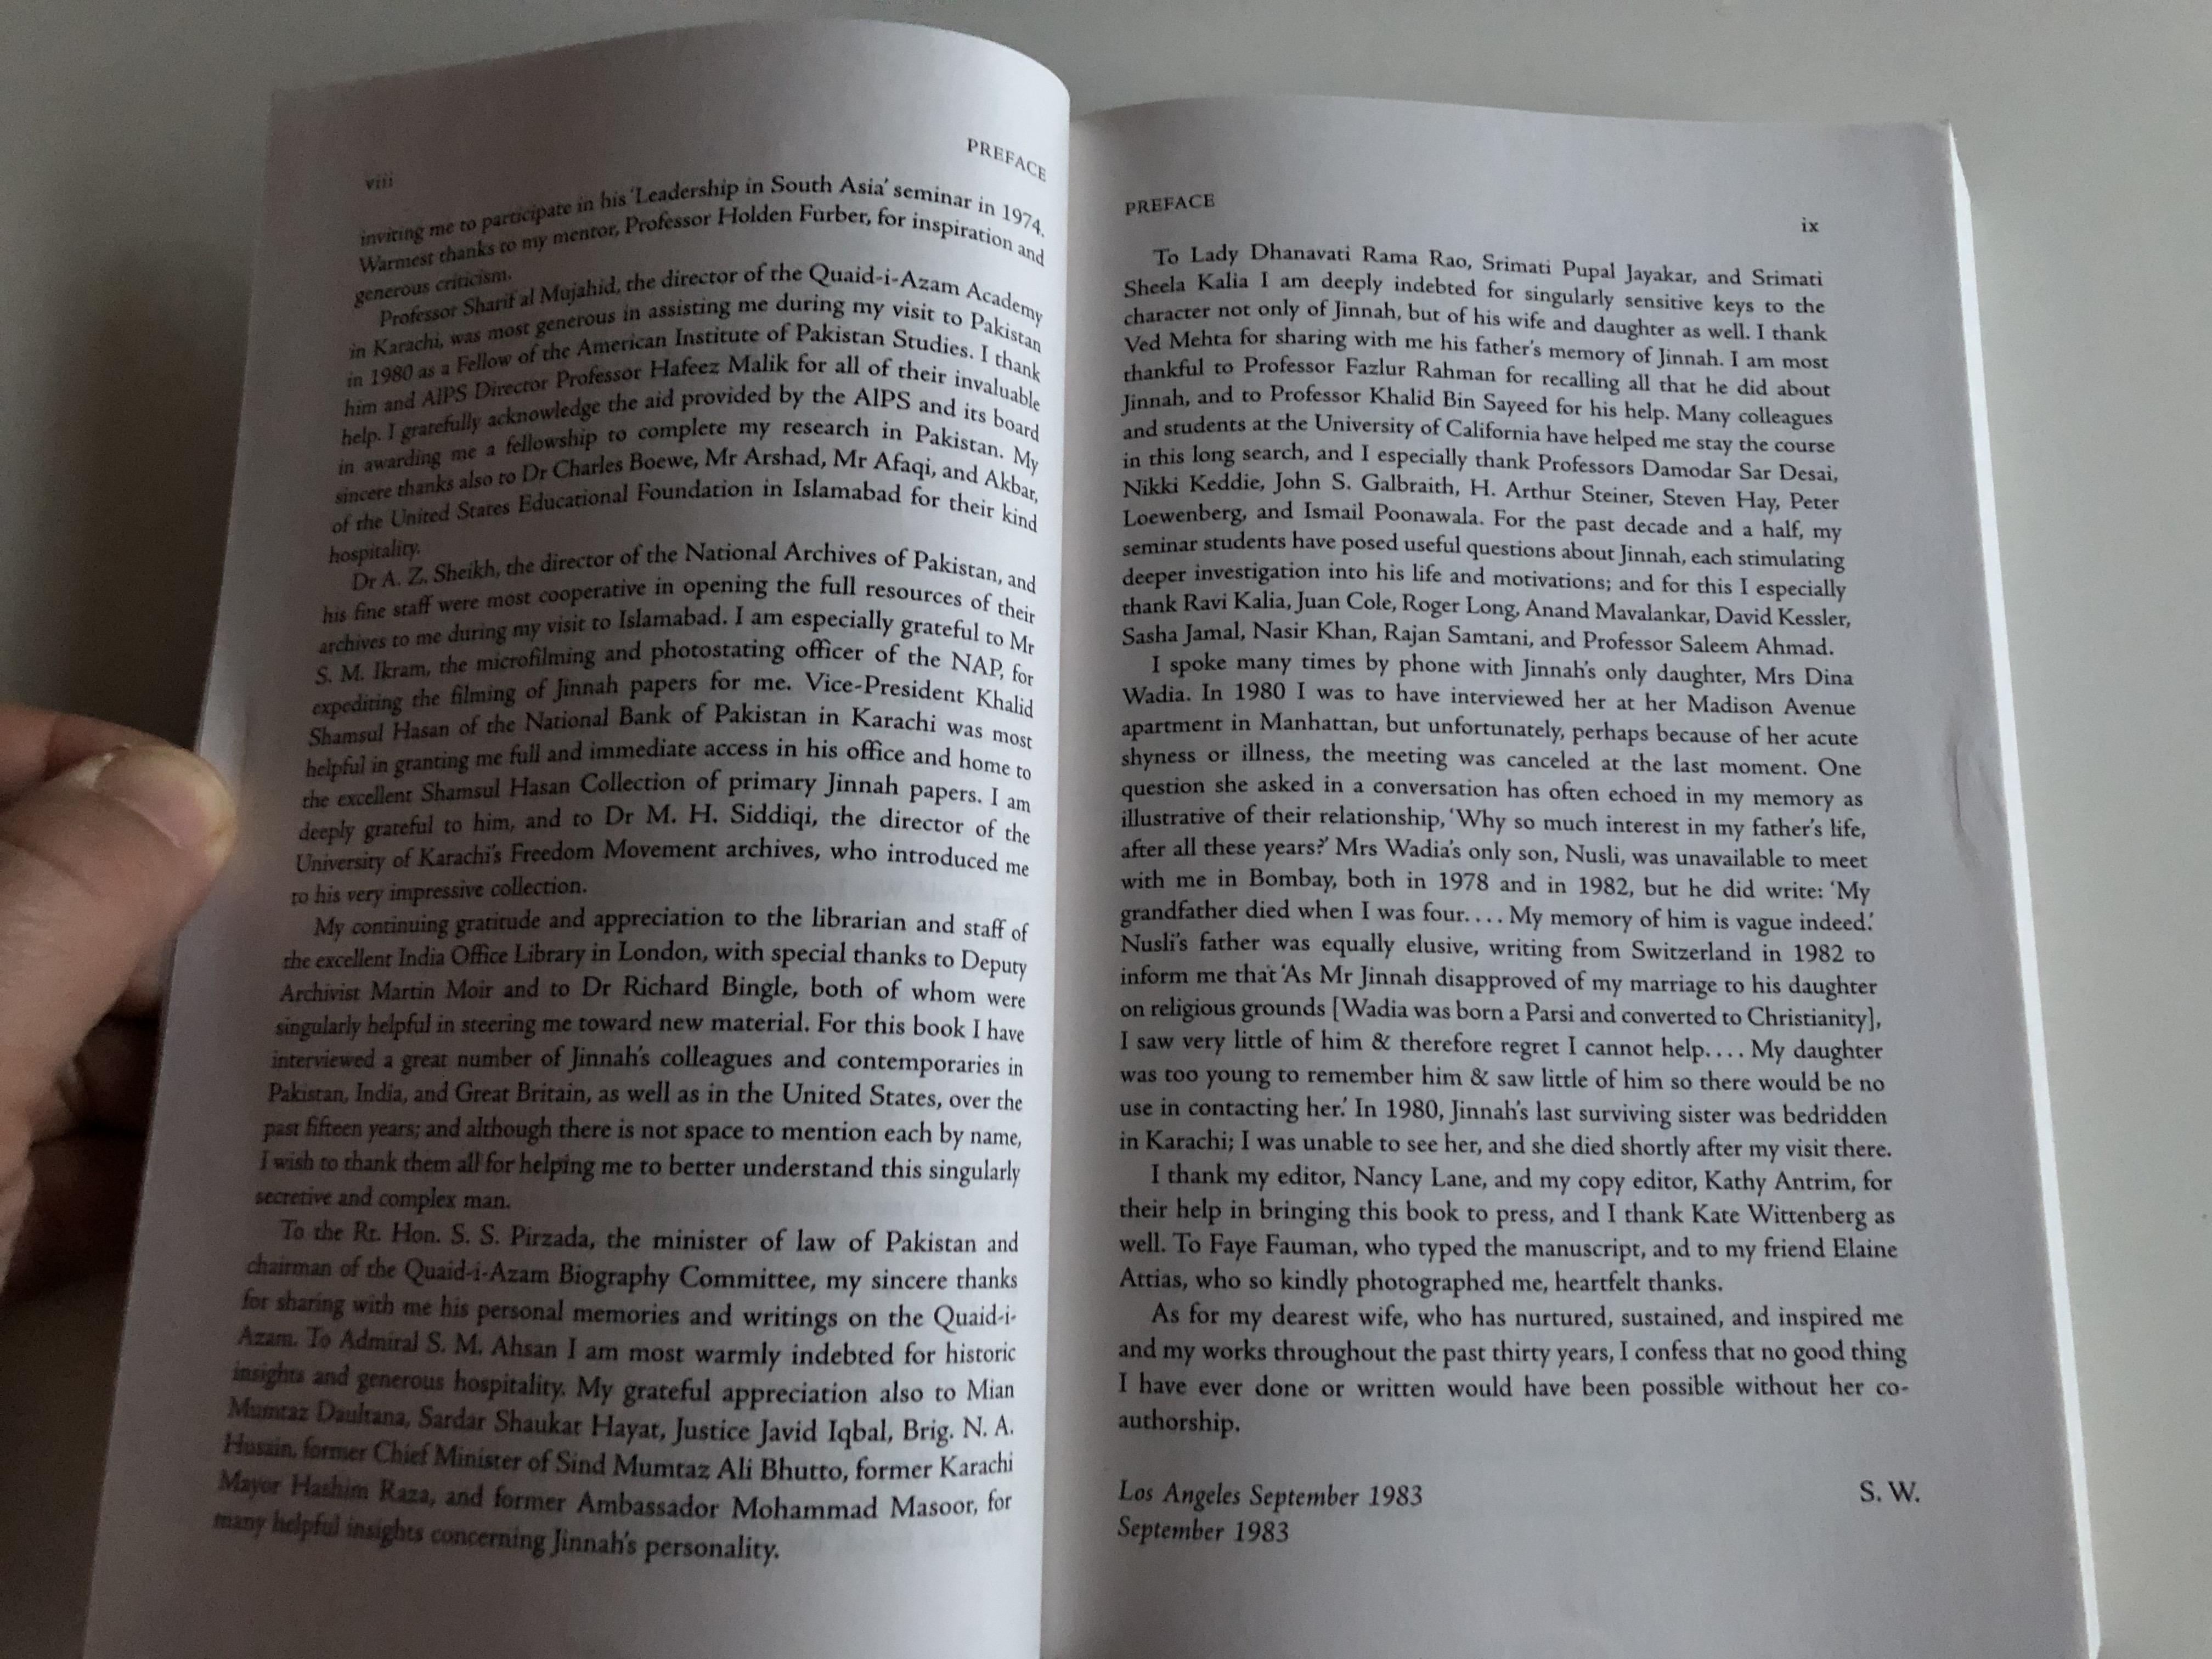 jinnah-of-pakistan-by-stanley-wolpert-oxford-pakistan-paperbacks-4-.jpg